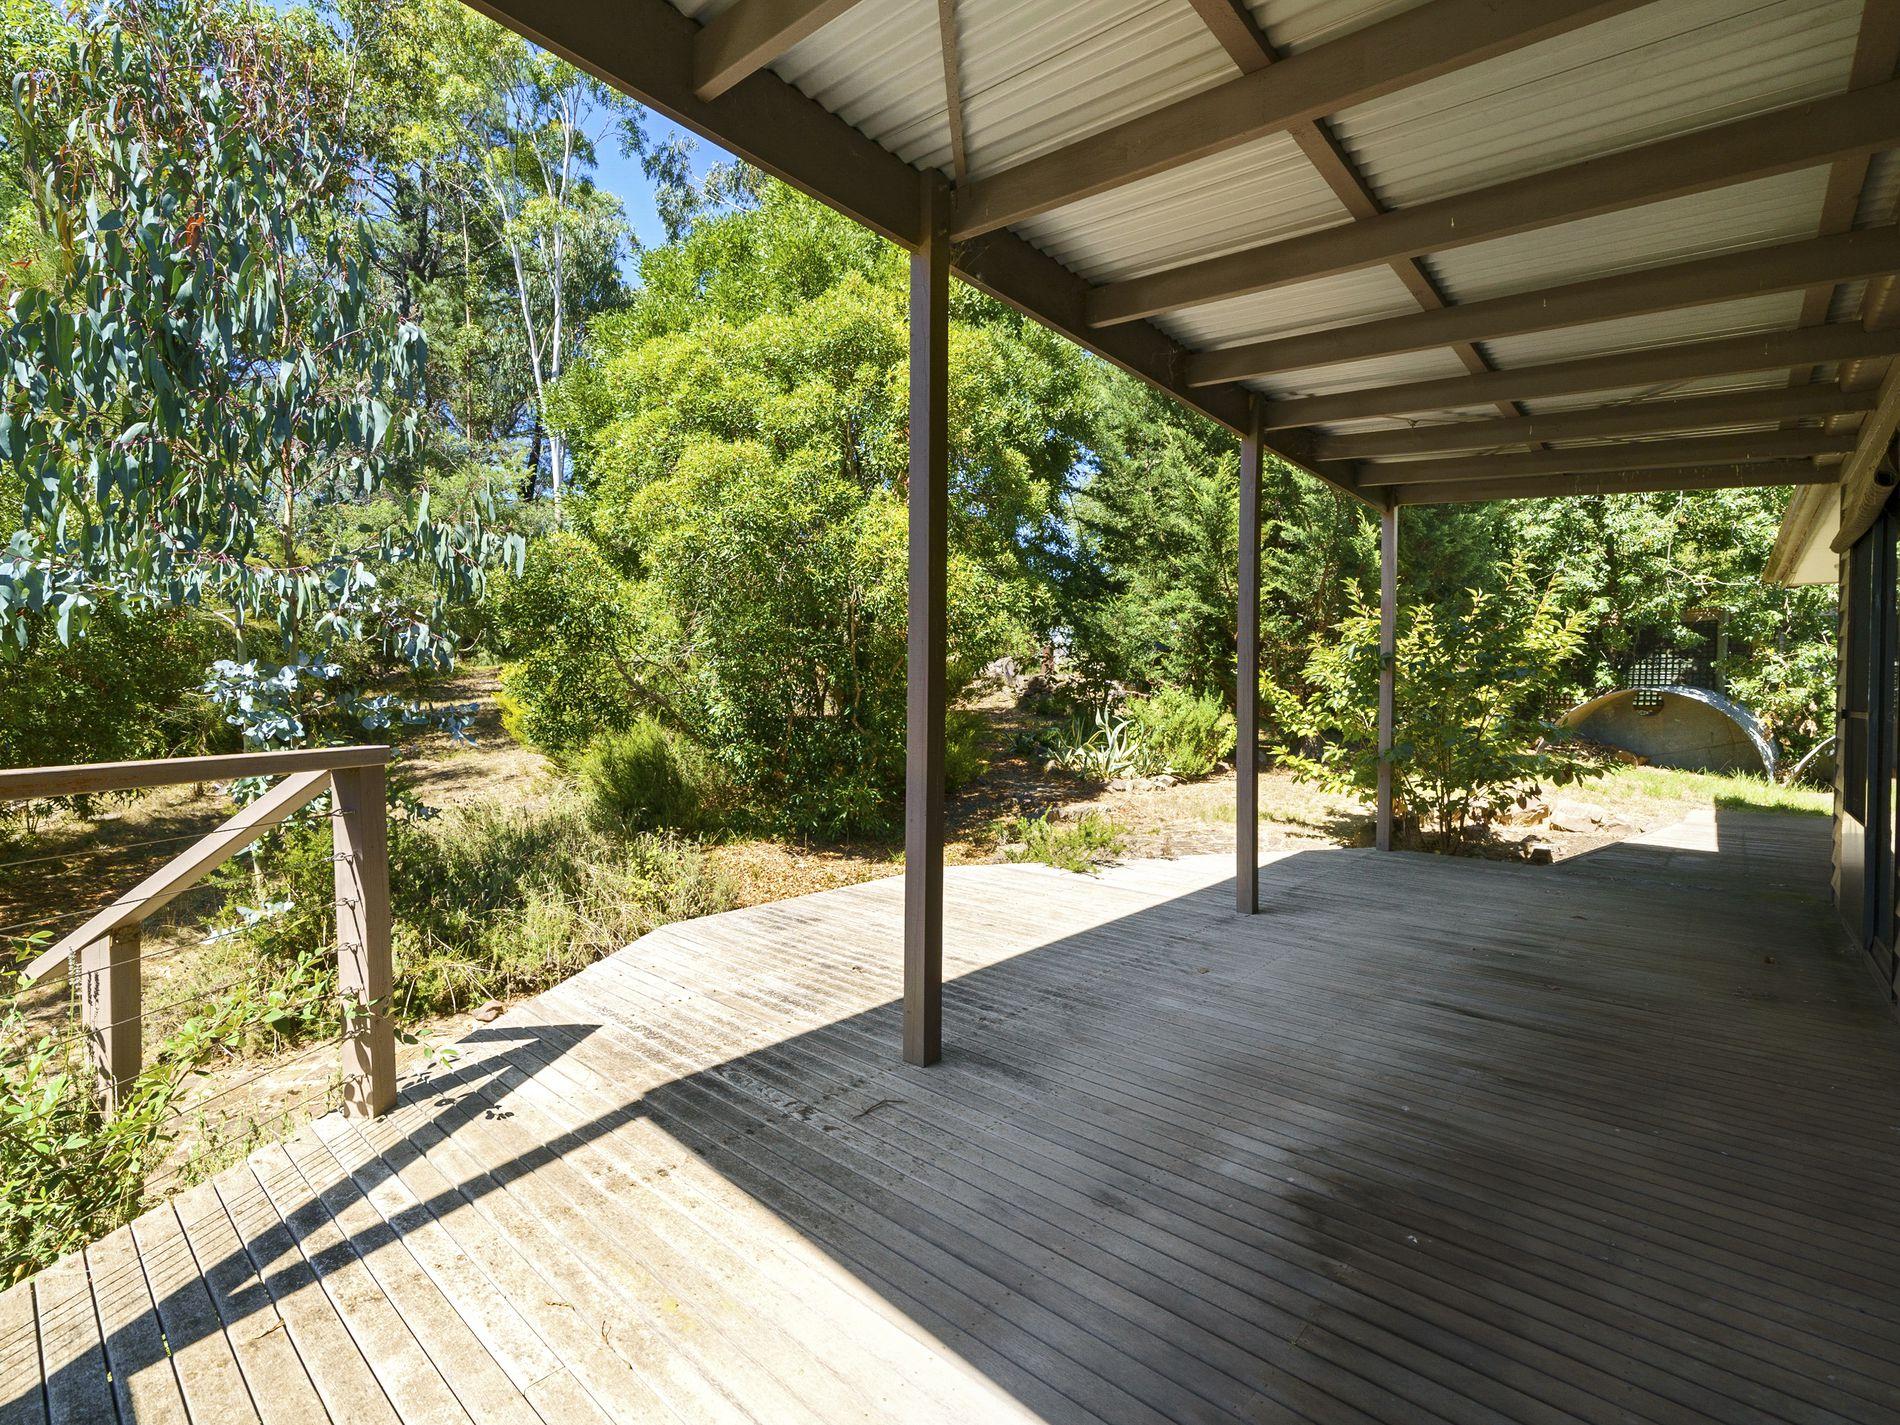 35 Willow Lake Drive, Macs Cove